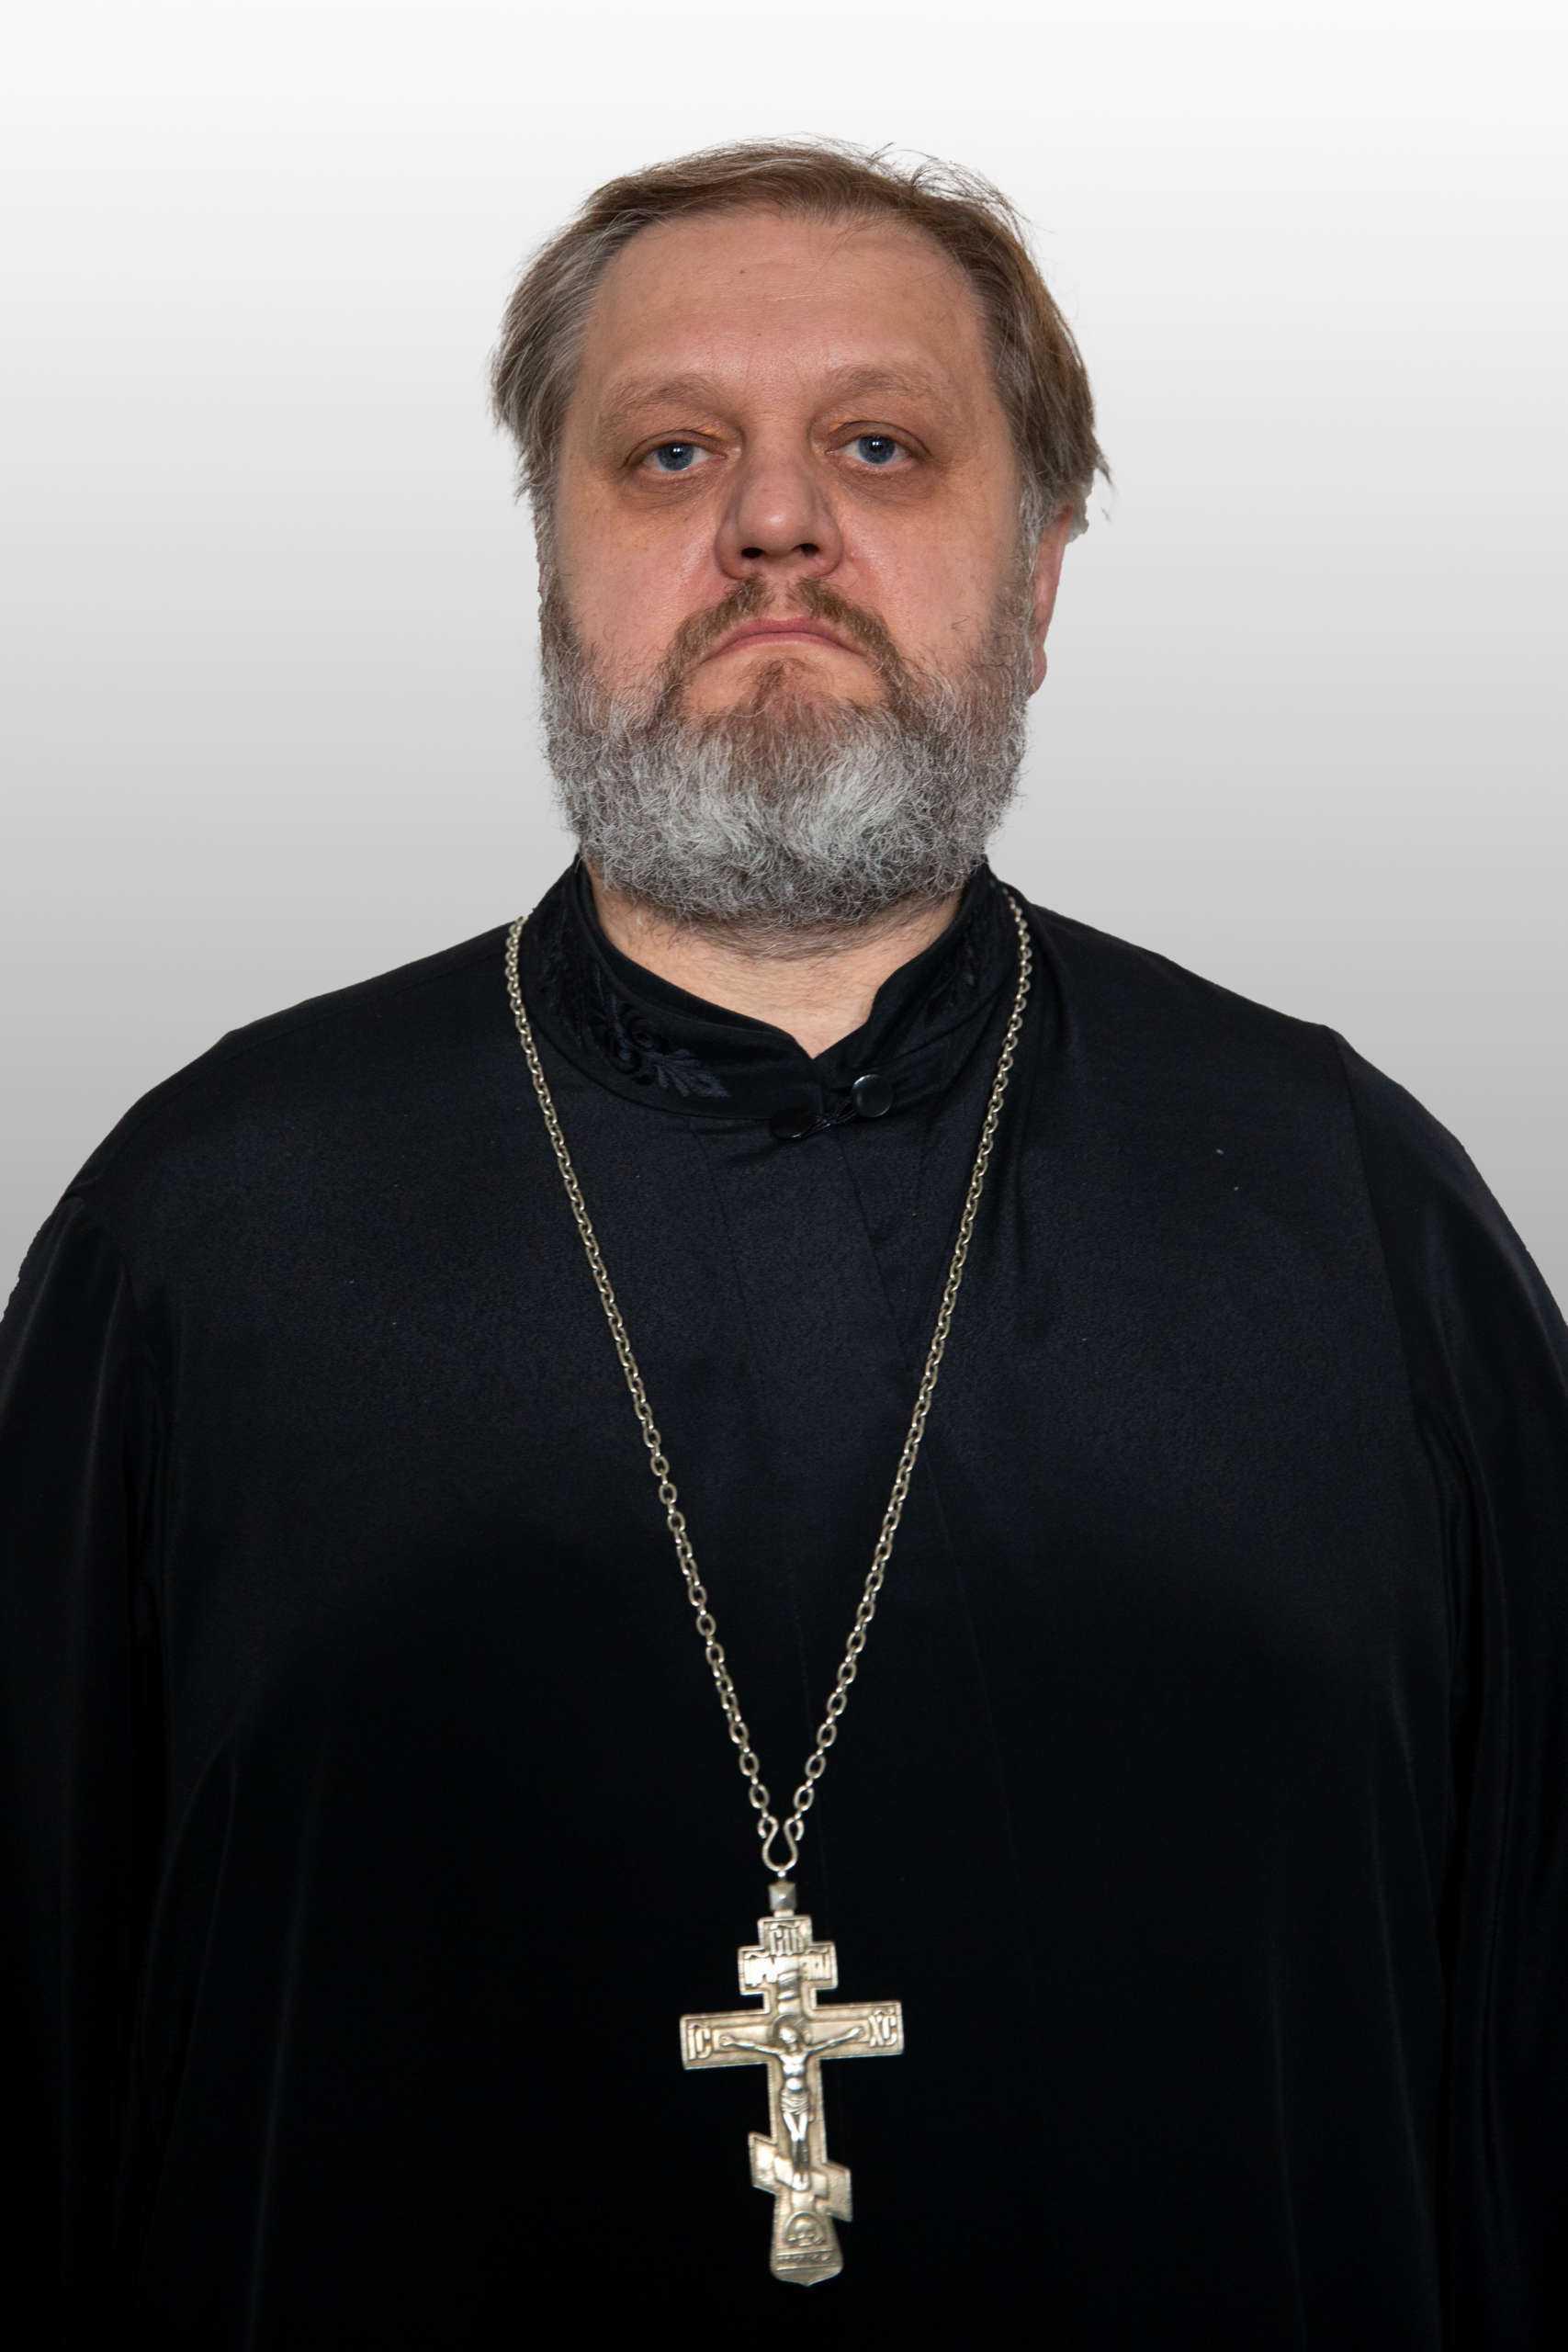 Иерей Георгий Рощупкин